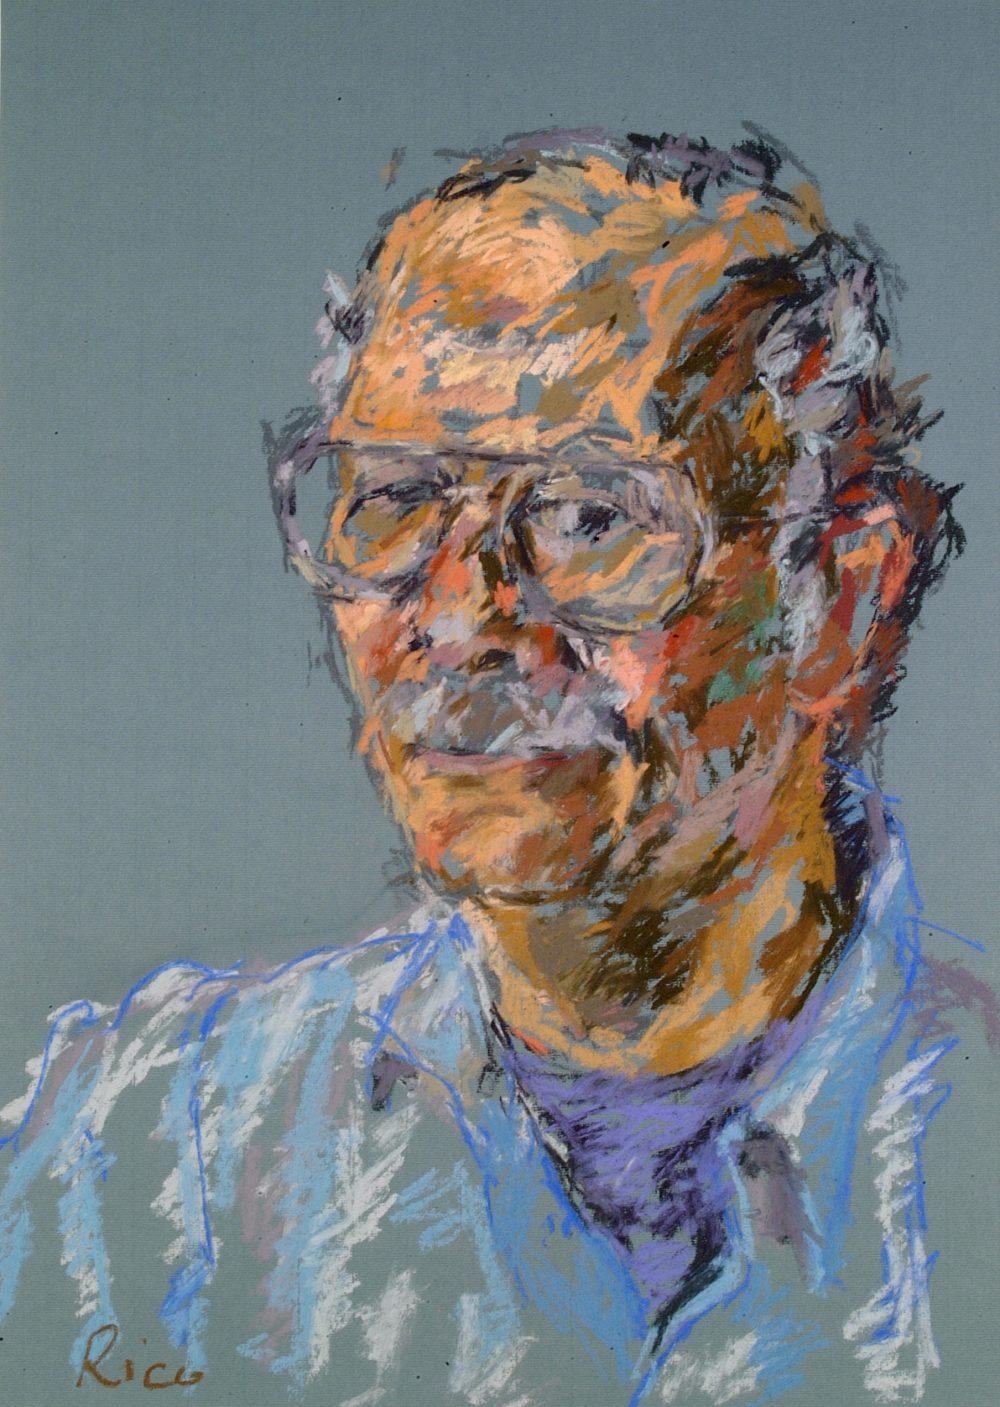 Ira Herskowitz - 2001